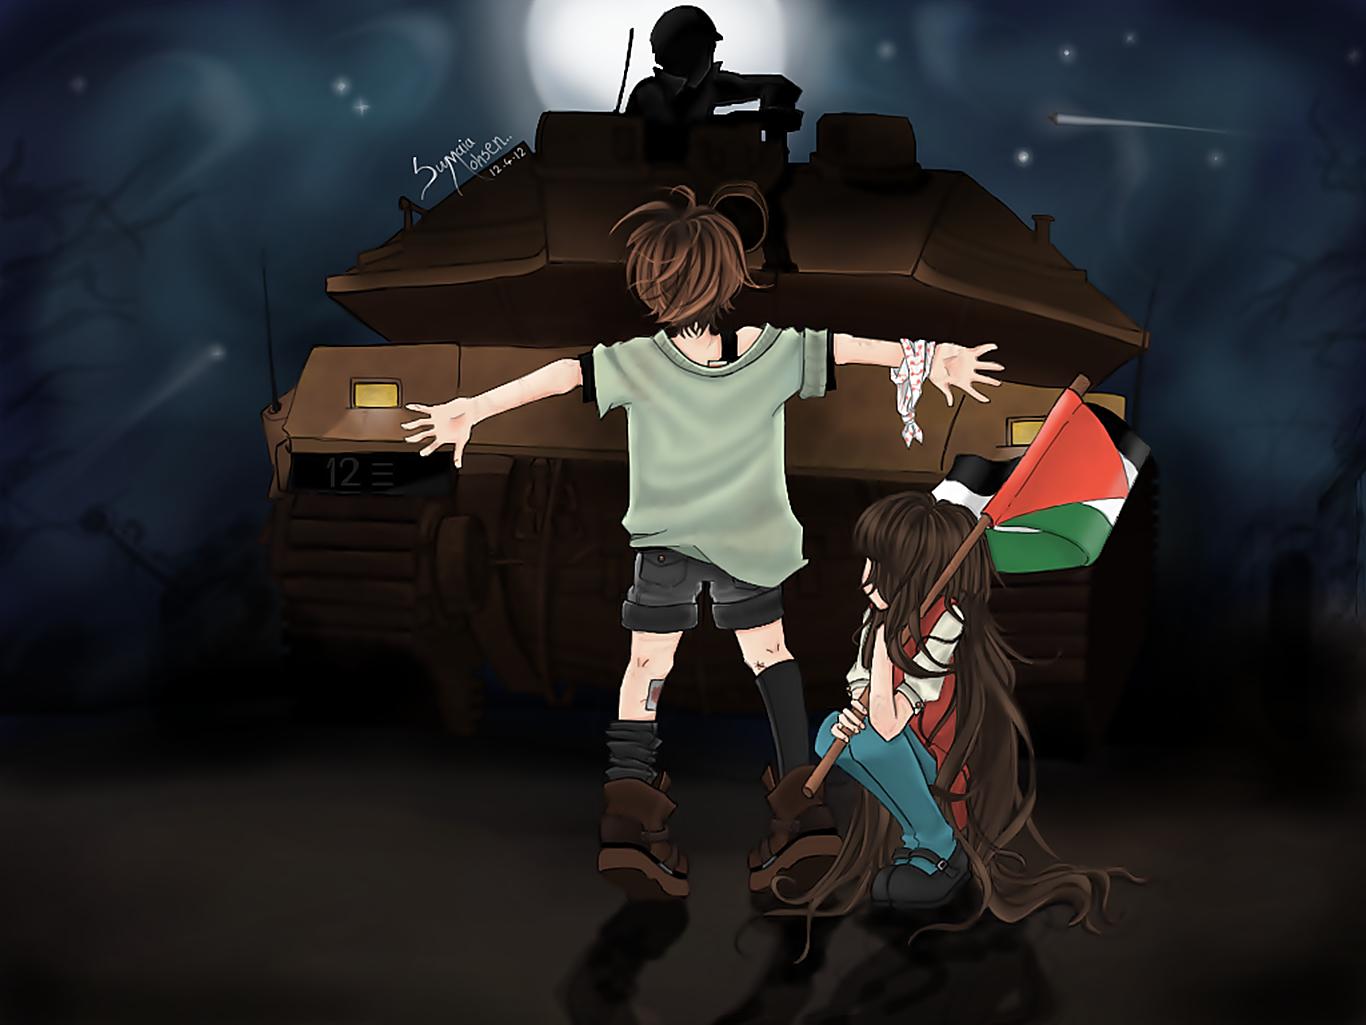 Wallpaper Palestine Caricature Tank Children Flag